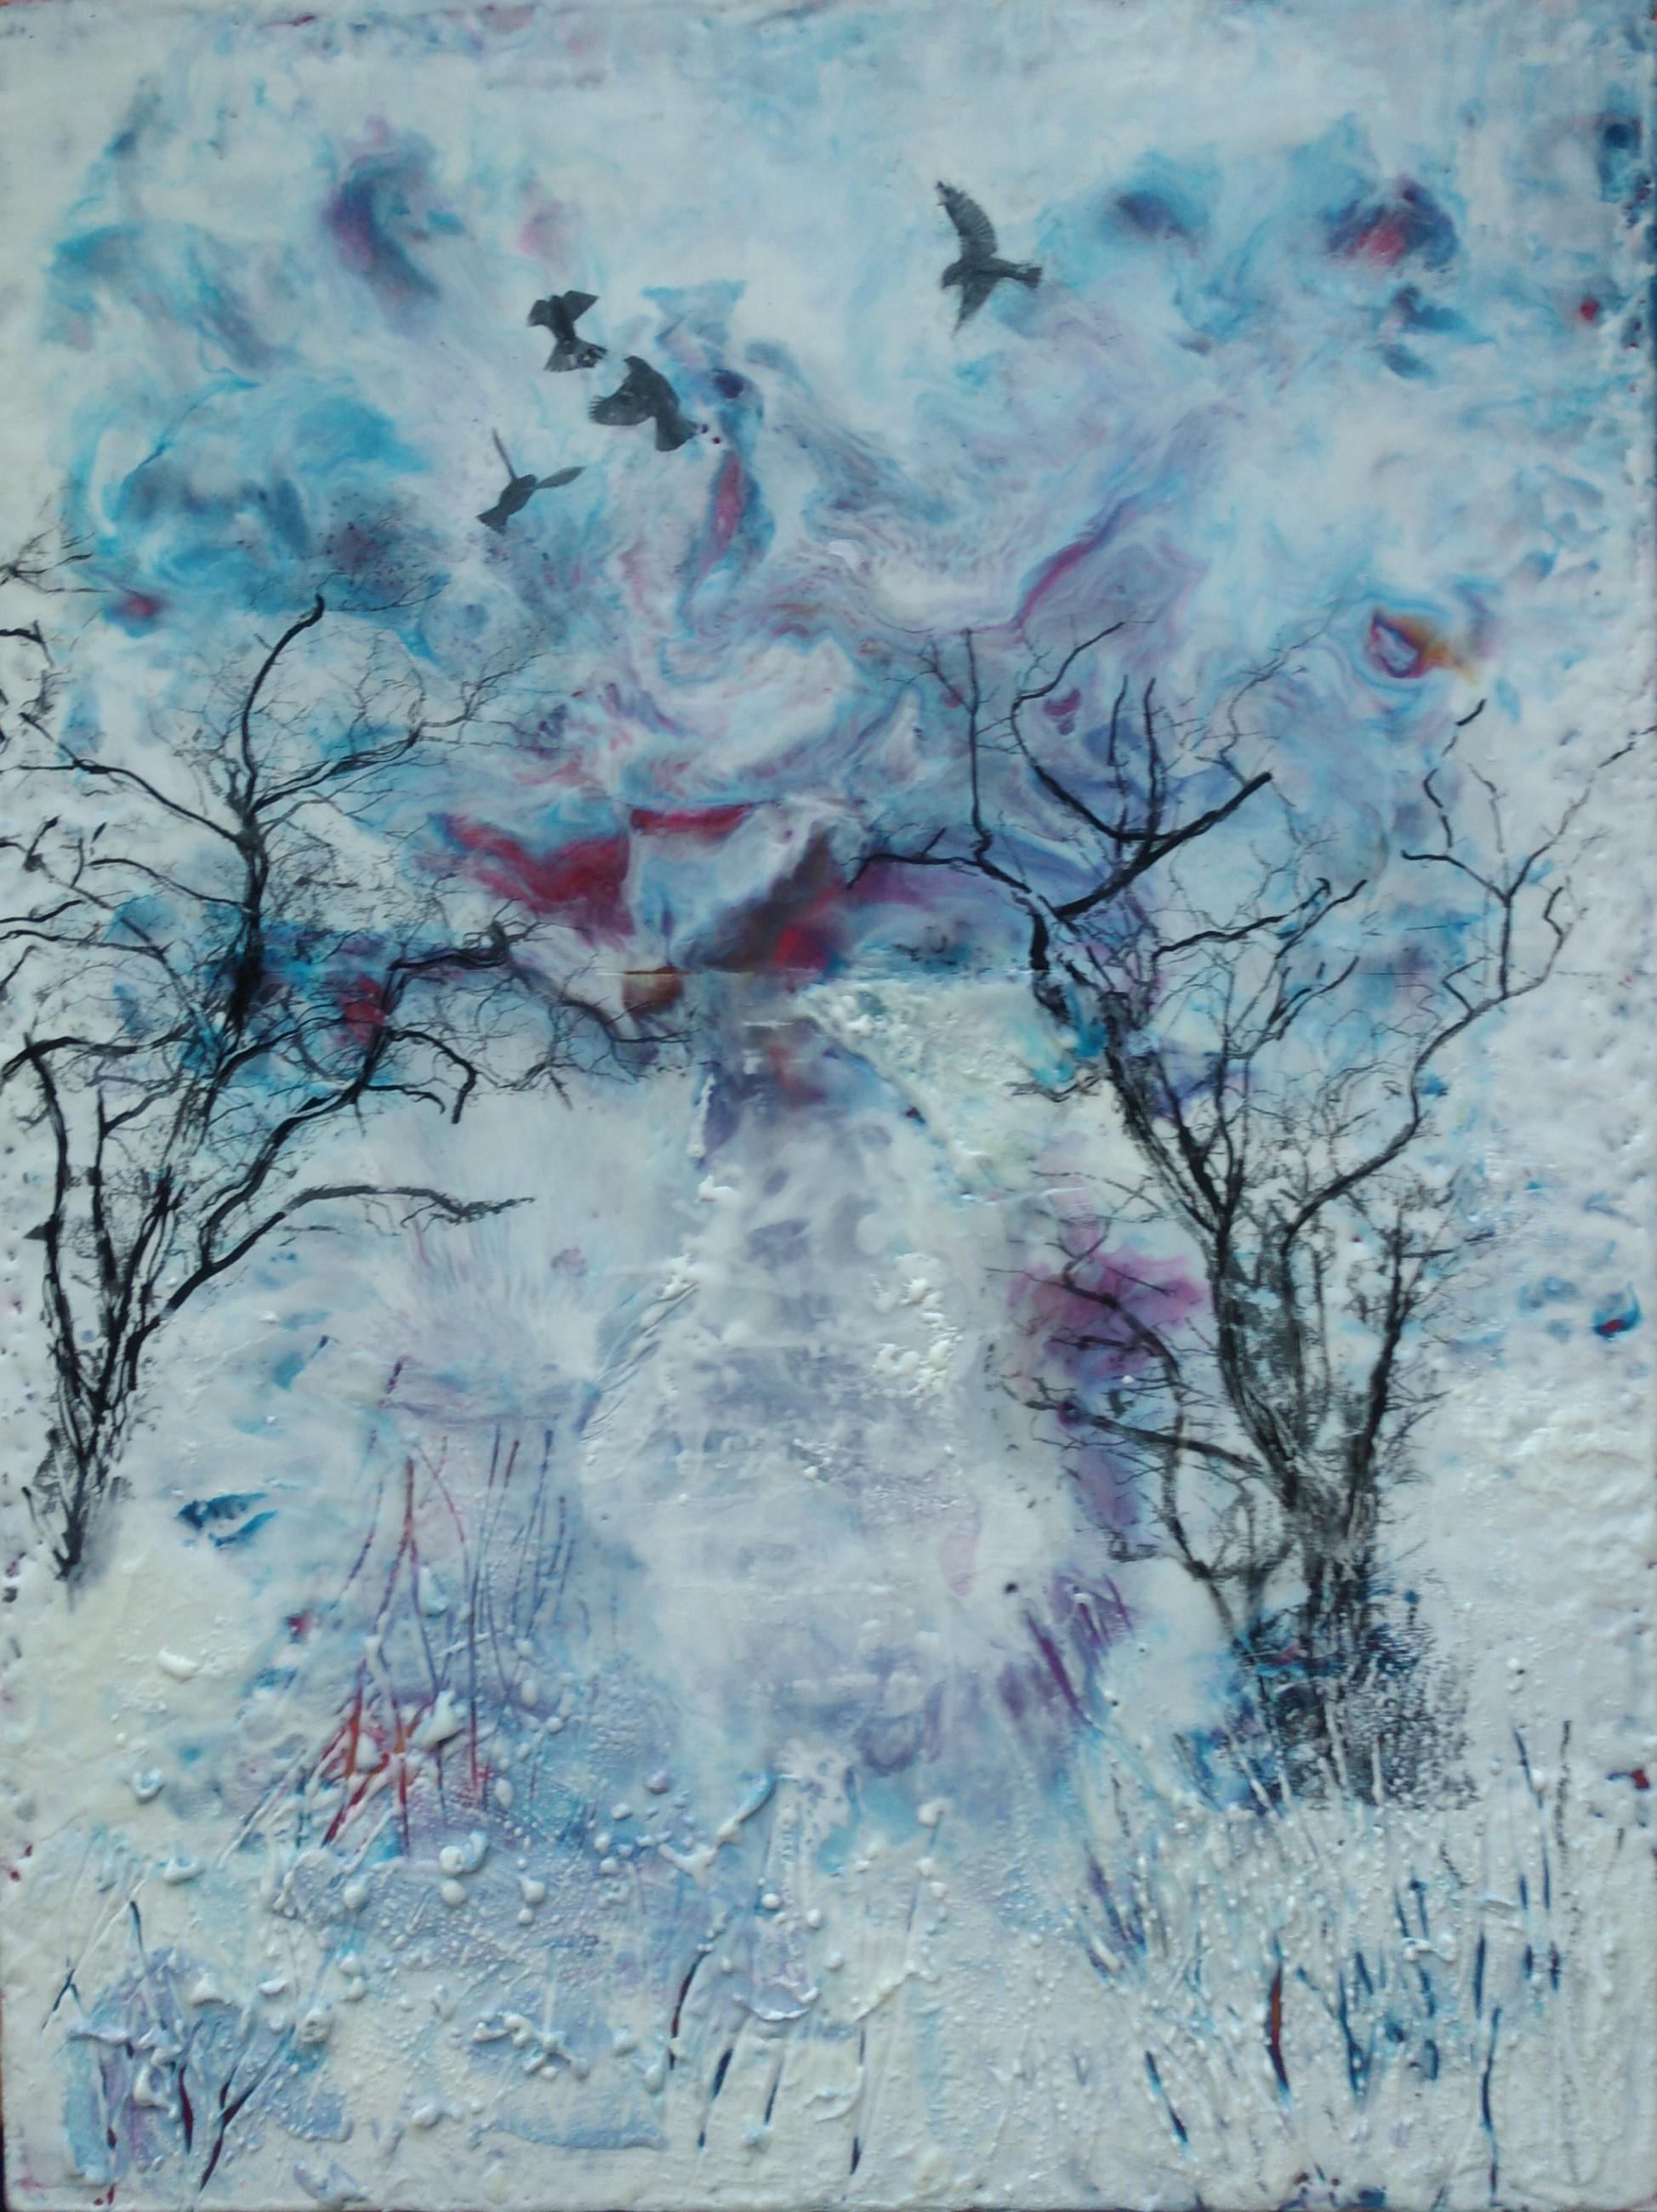 Hieblinger, Listen, encaustic, 12wx24h, 1.5 gallery mount, $230